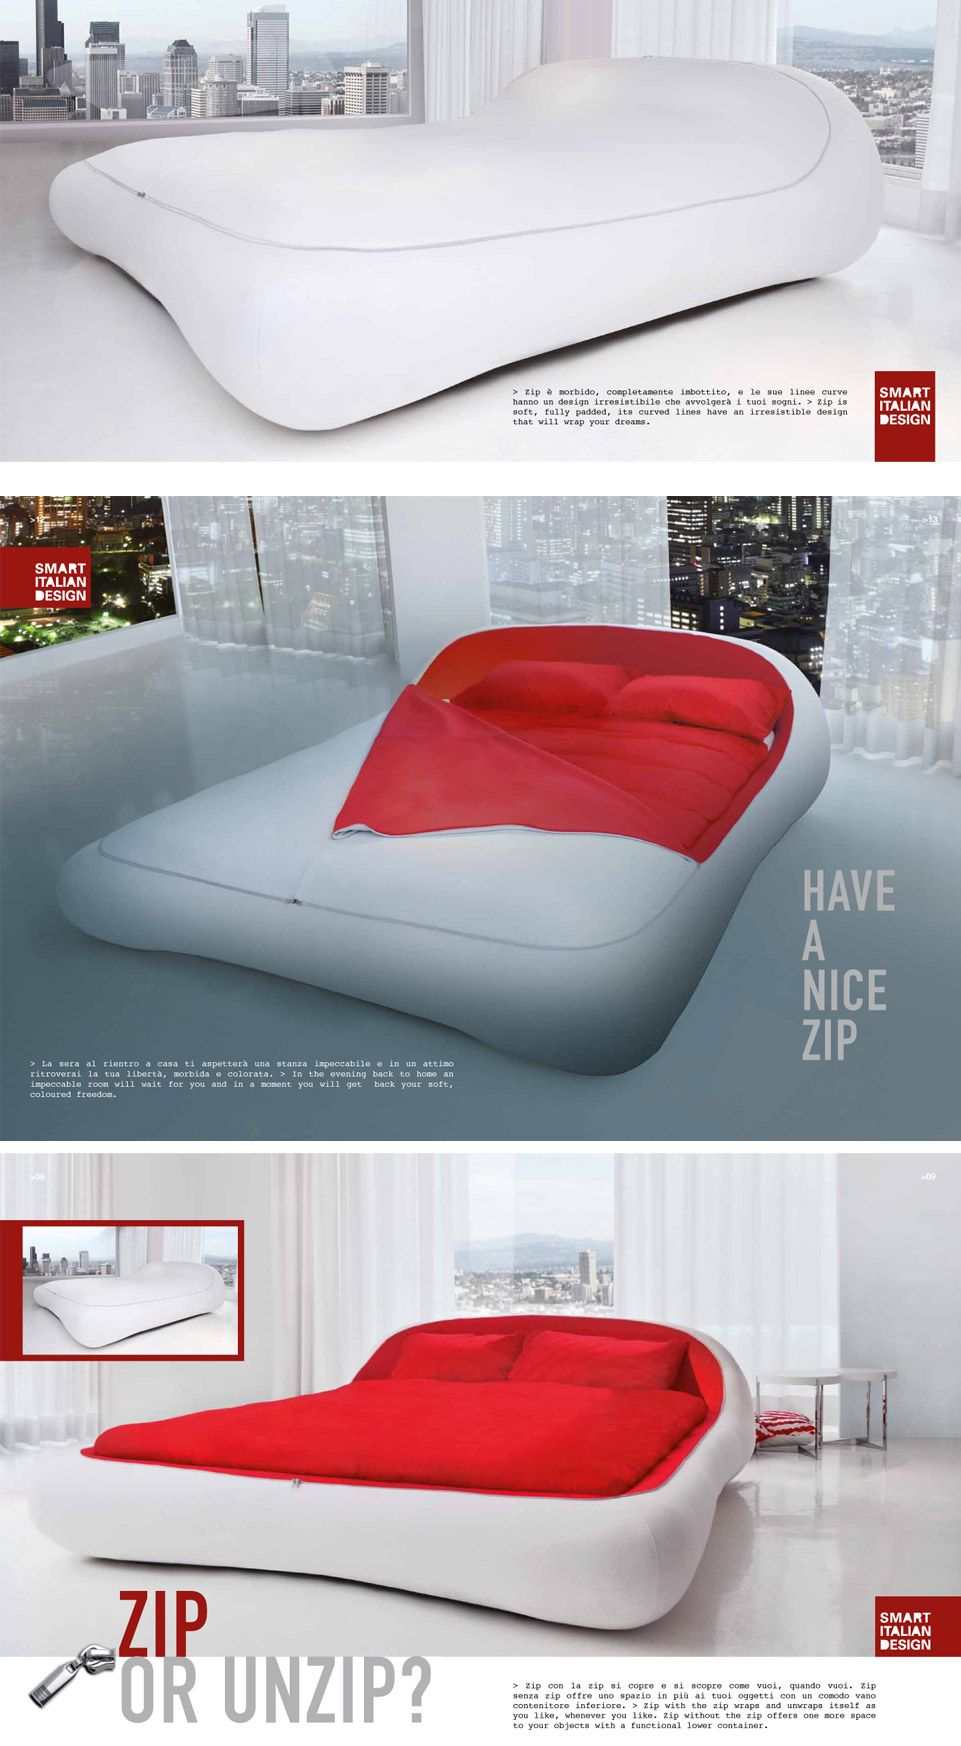 Letto Zip Bed Florida Smart Italian Design Svpply Cama